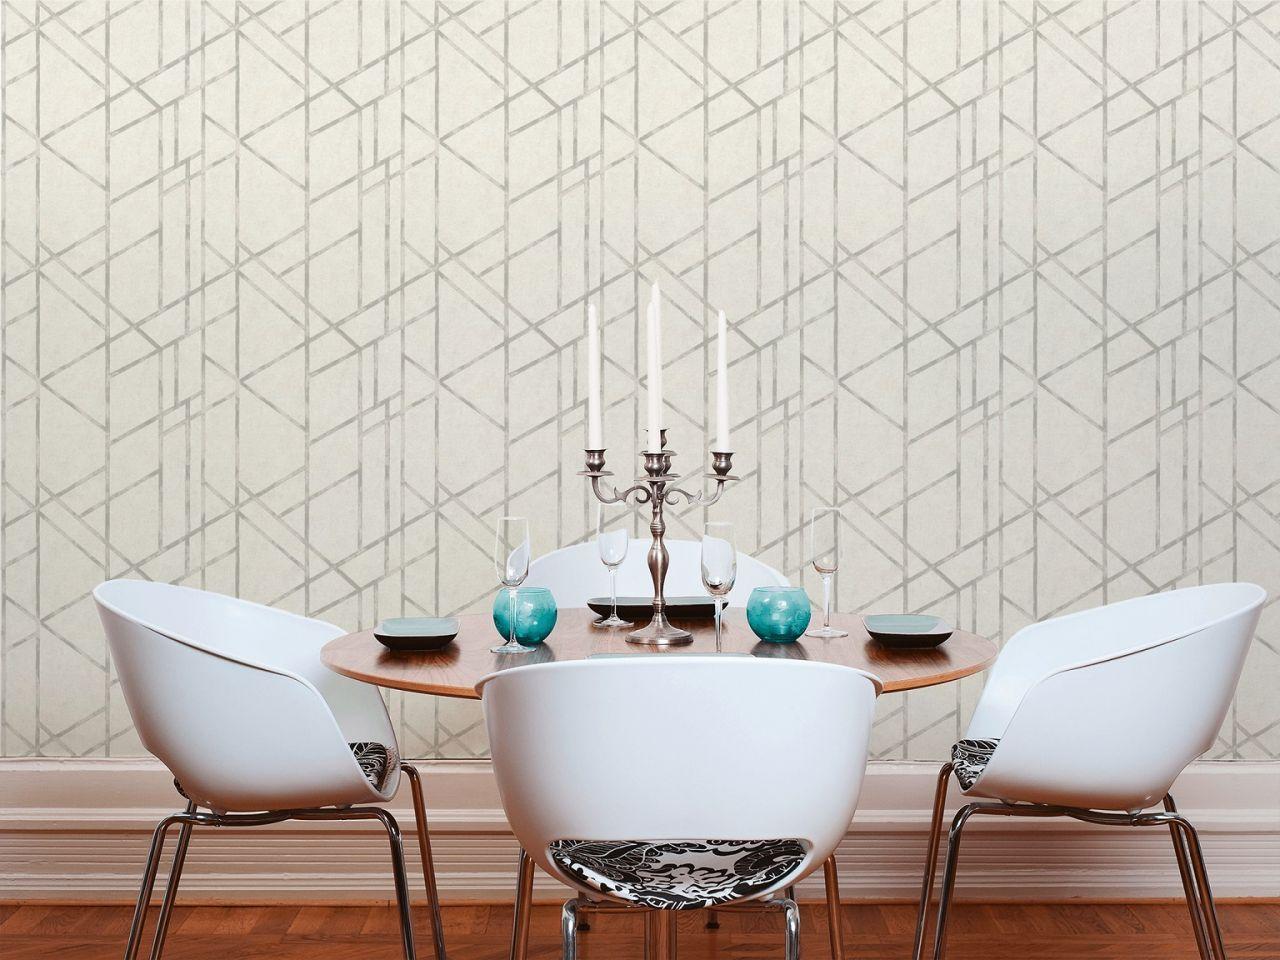 Vliestapete Design Muster Silber Grau Metallic